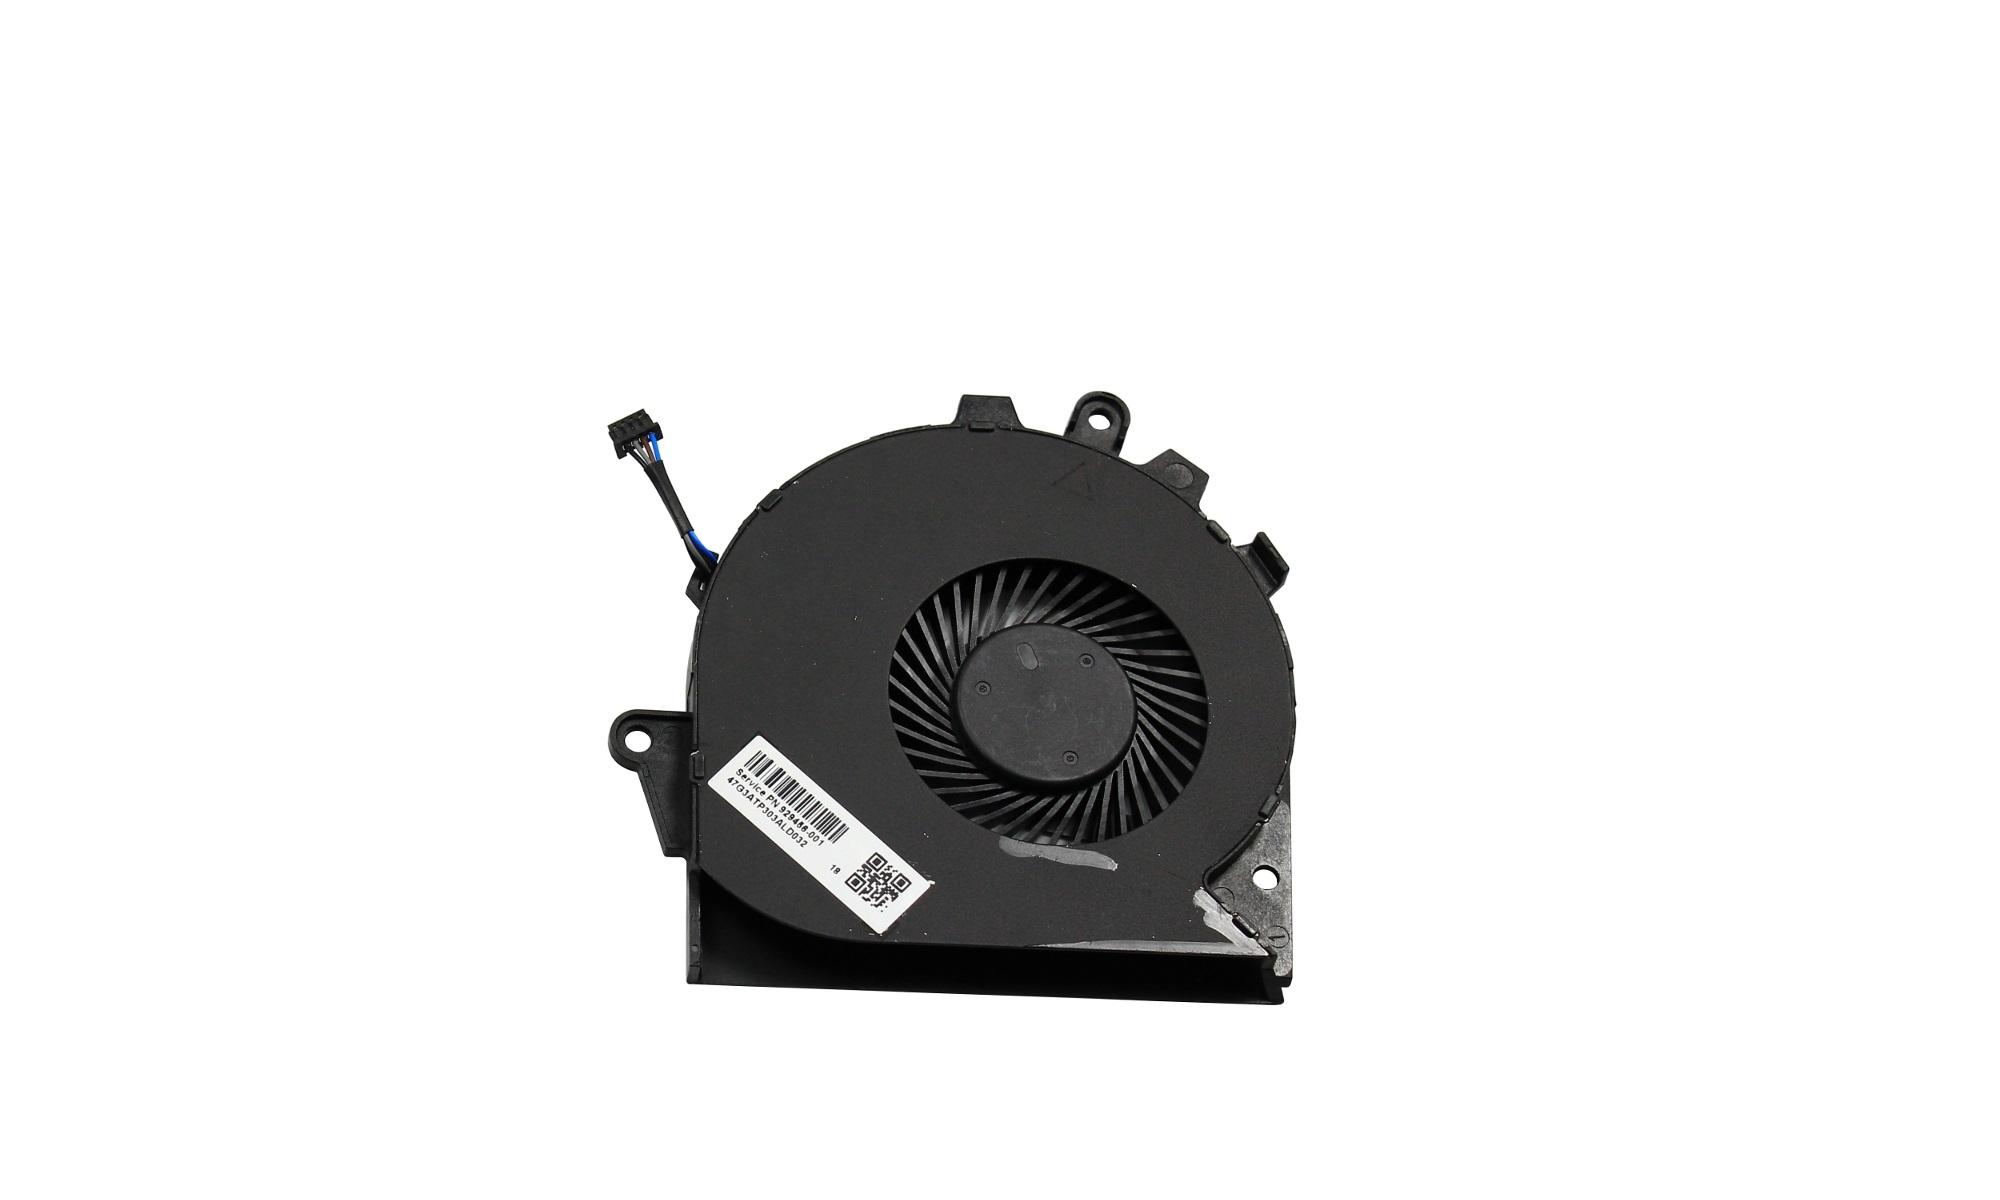 Cooler original dreapta HP Omen 15-CE, NS85B00-16M03, model 929456-001